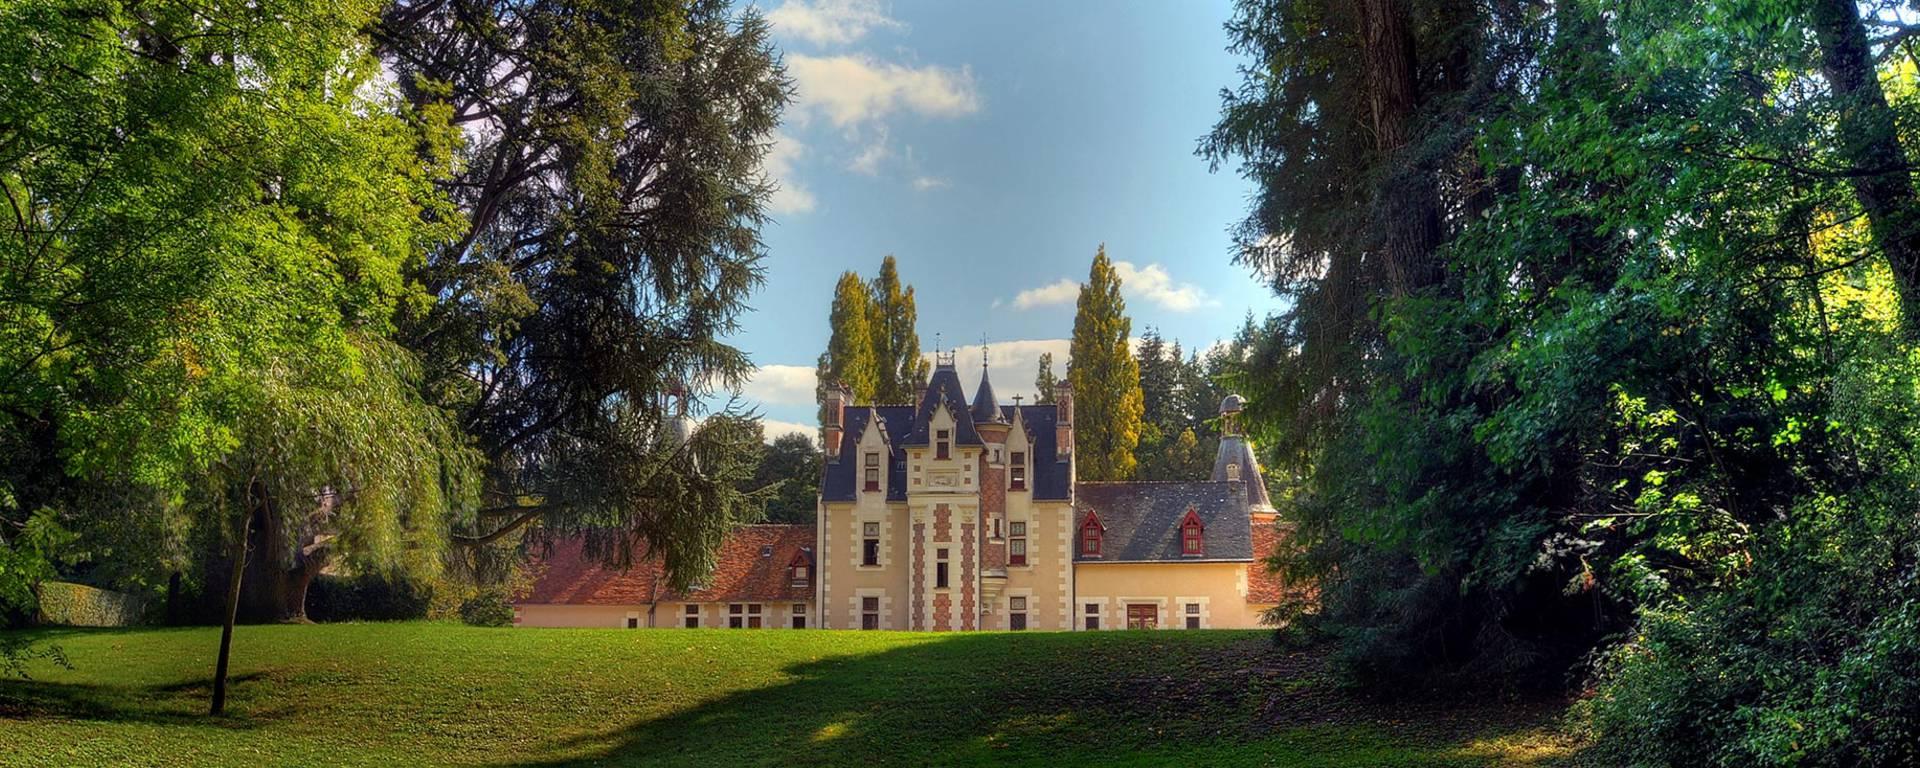 El parque del castillo de Troussay